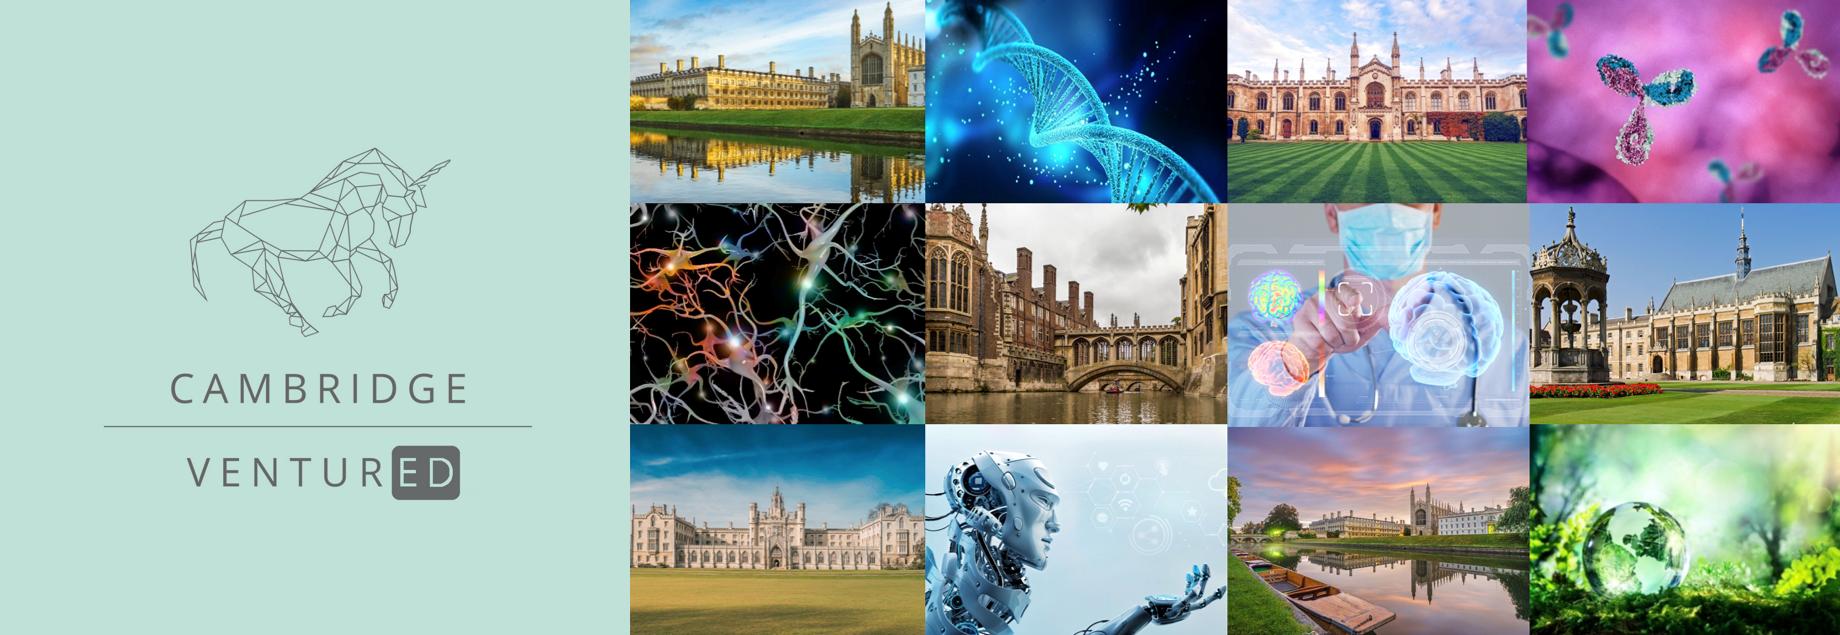 CambridgeVenturED_Header